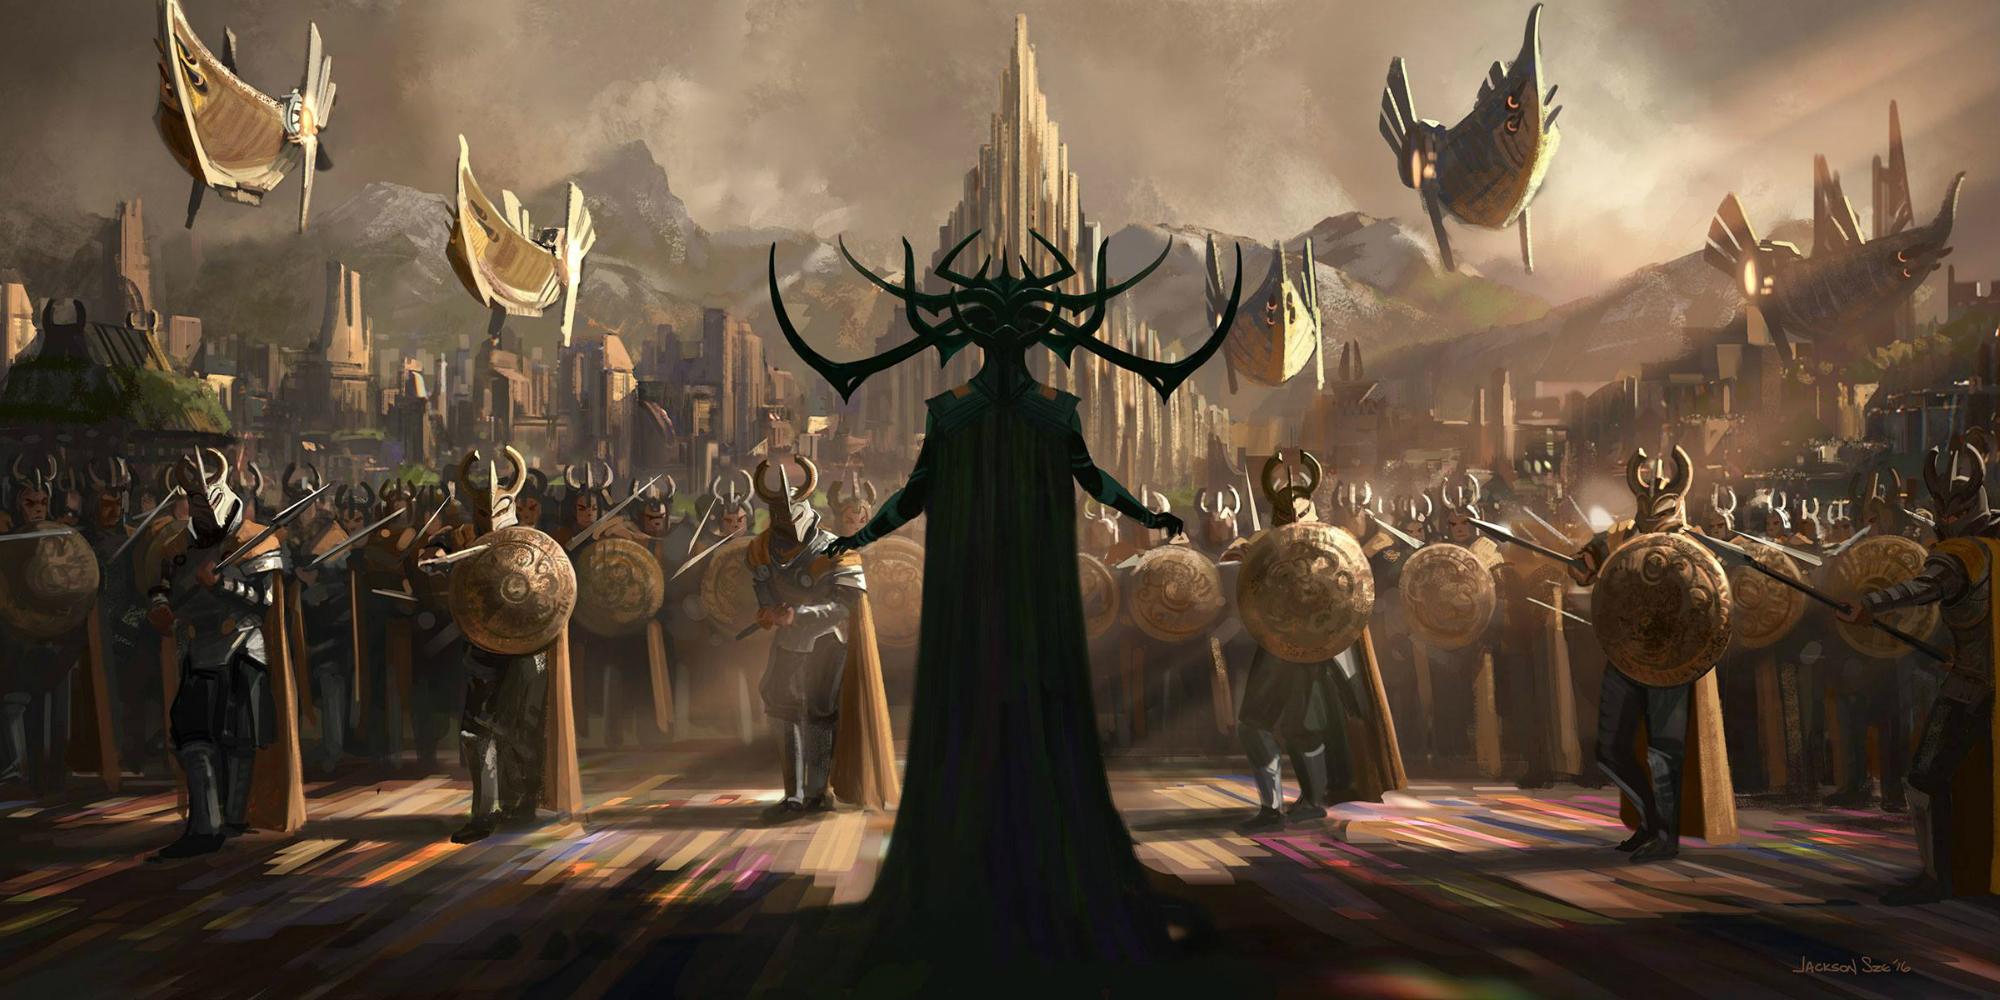 Hela concept art for Thor Ragnarok